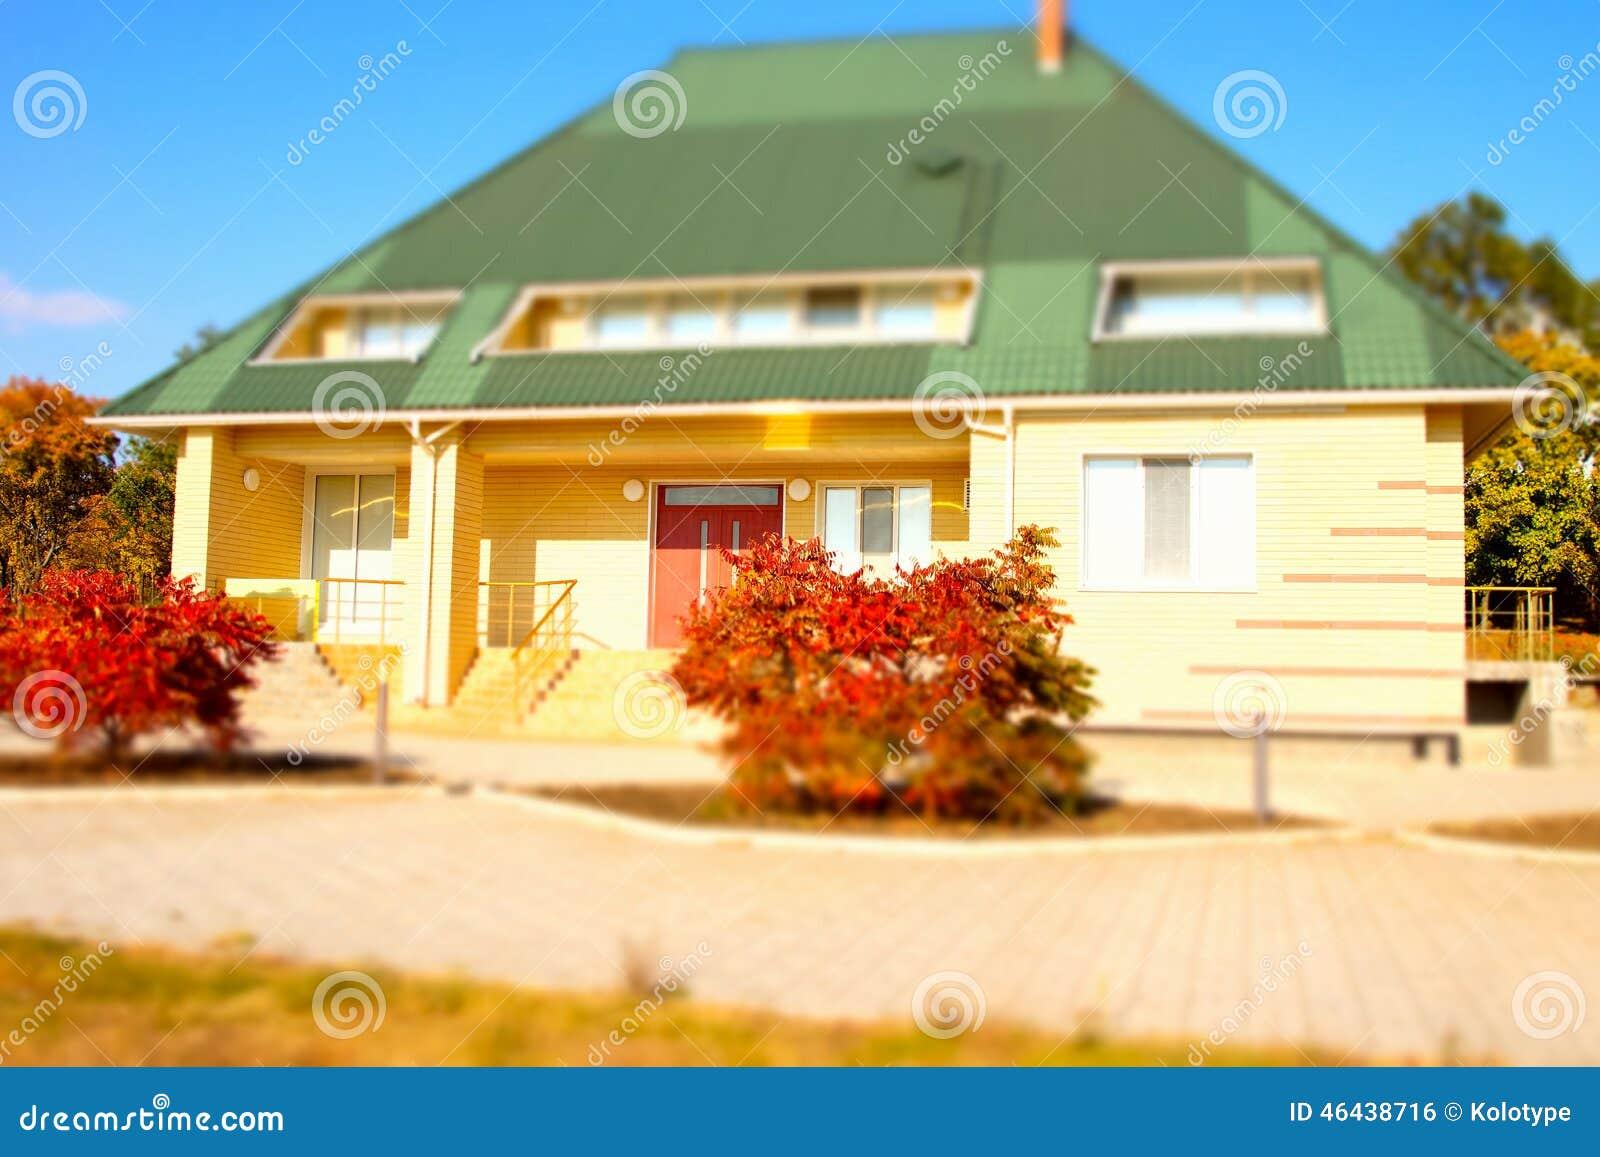 Dise o exterior de la casa arquitect nica de la casa de for Diseno casa planta baja